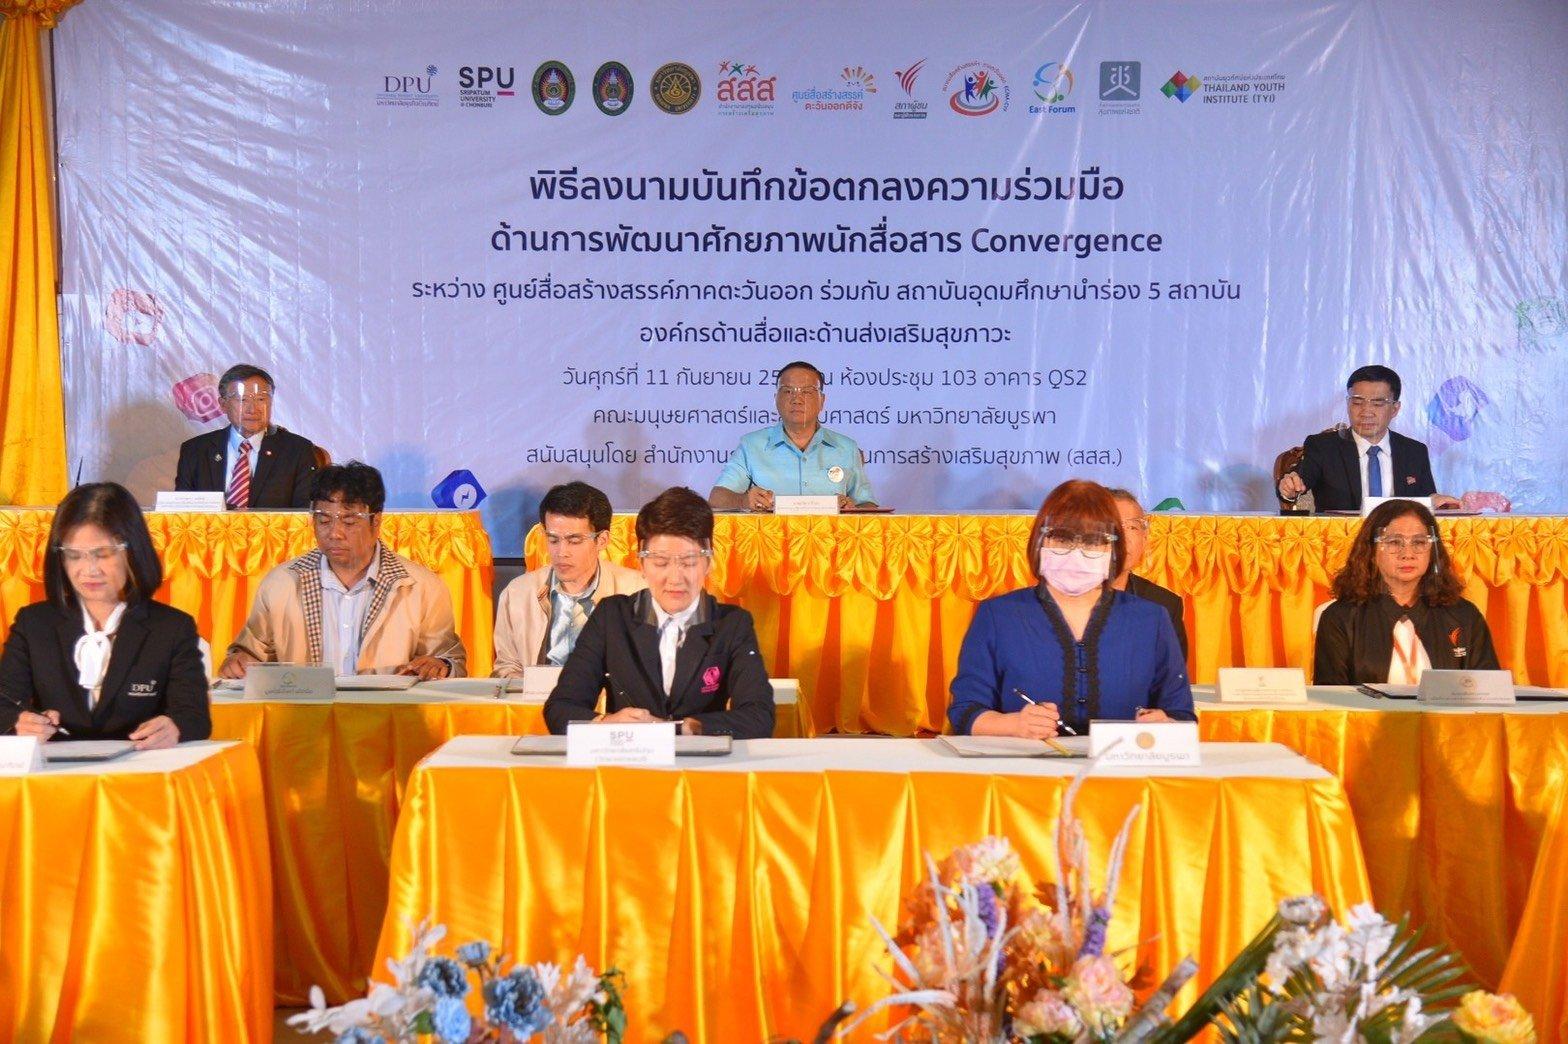 MOU ความร่วมมือด้านการพัฒนาศักยภาพนักสื่อสาร Convergence thaihealth